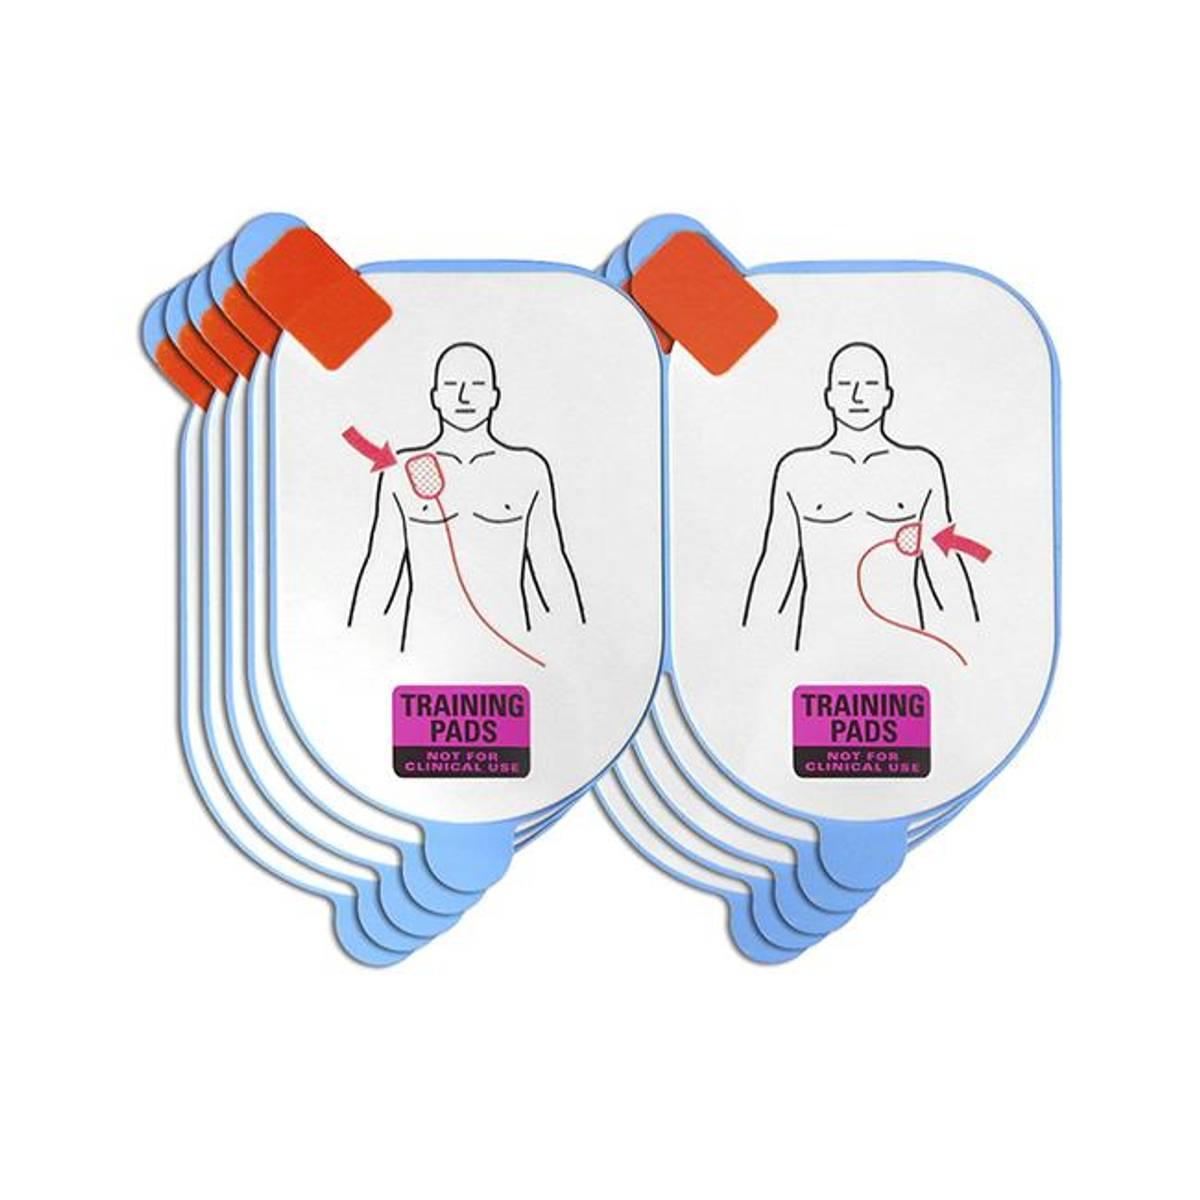 Lifeline View elektroder til trening u/kabel 5 pk